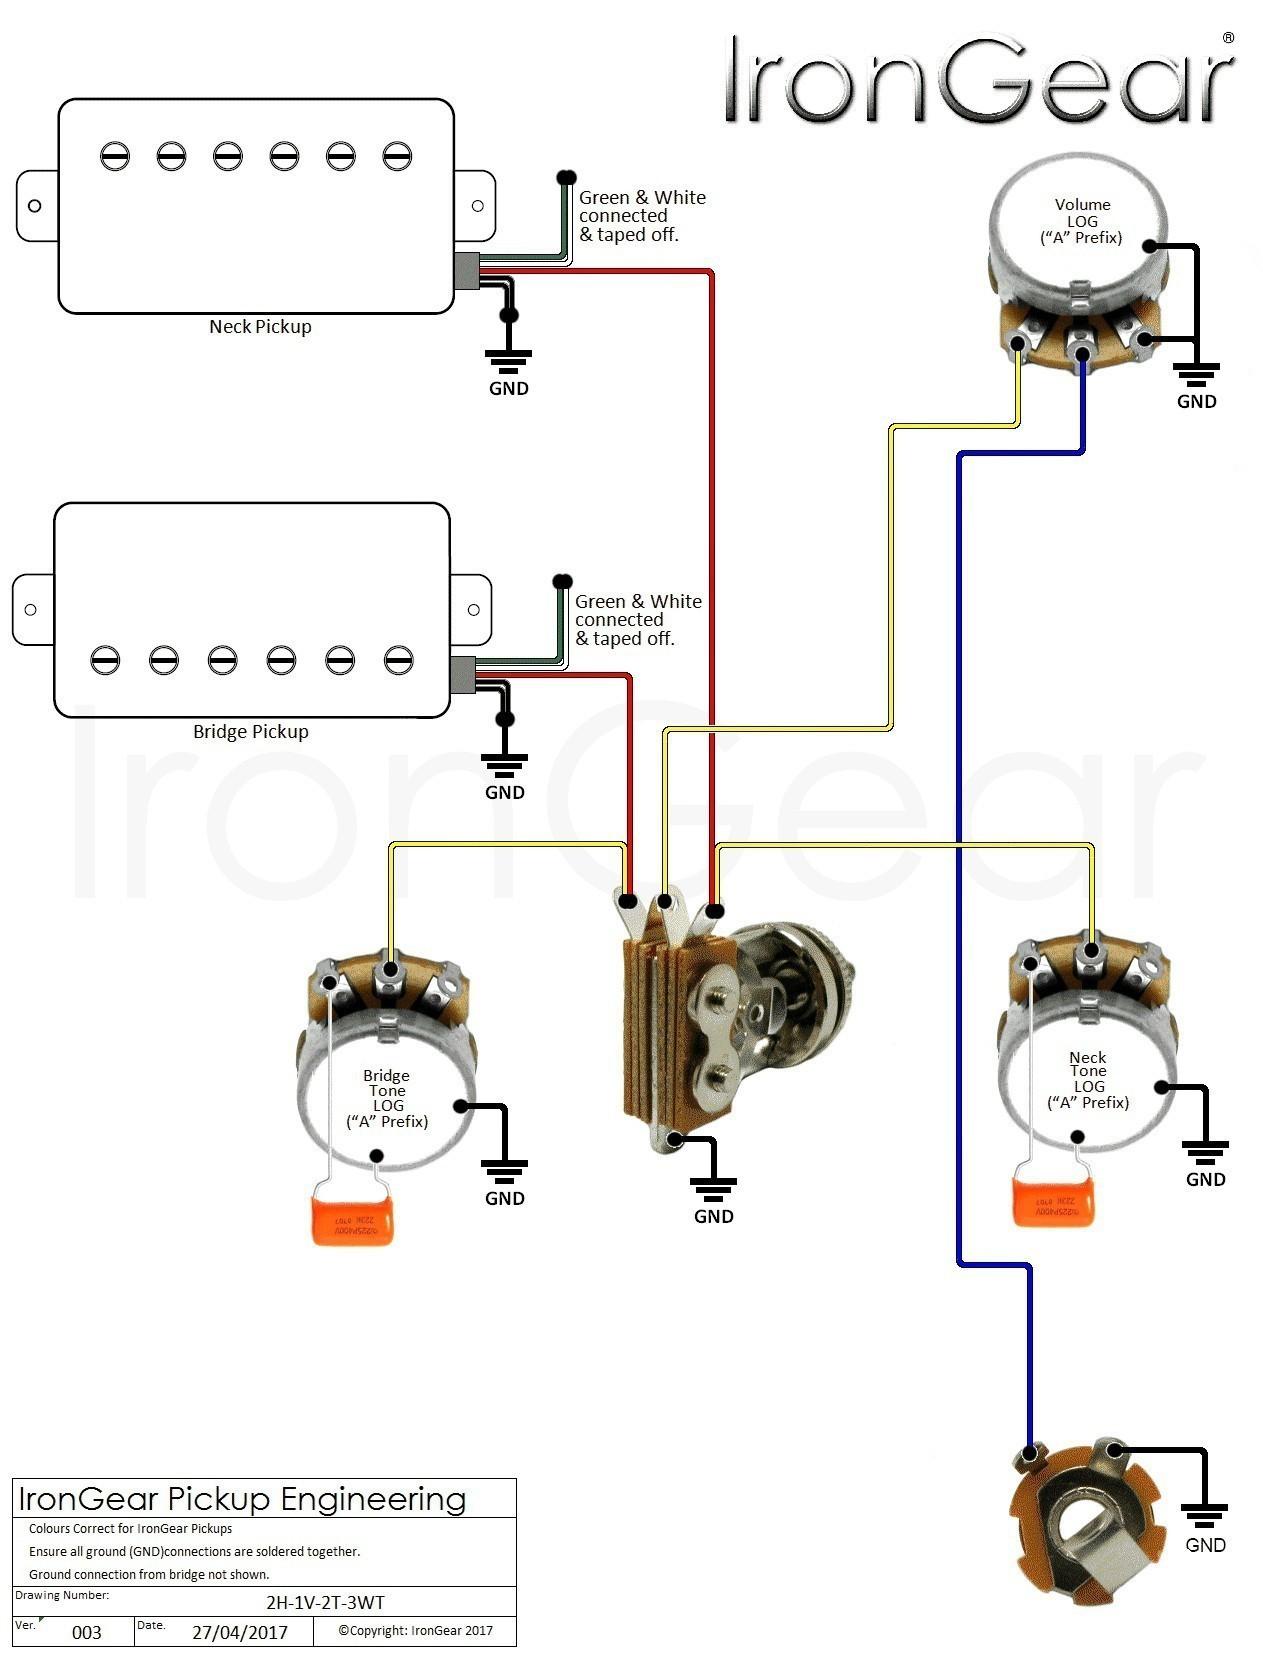 Wiring Diagram Guitar Pickups Inspirationa Inspirationa Guitar Wiring Diagram 1 Pickup 1 Volume